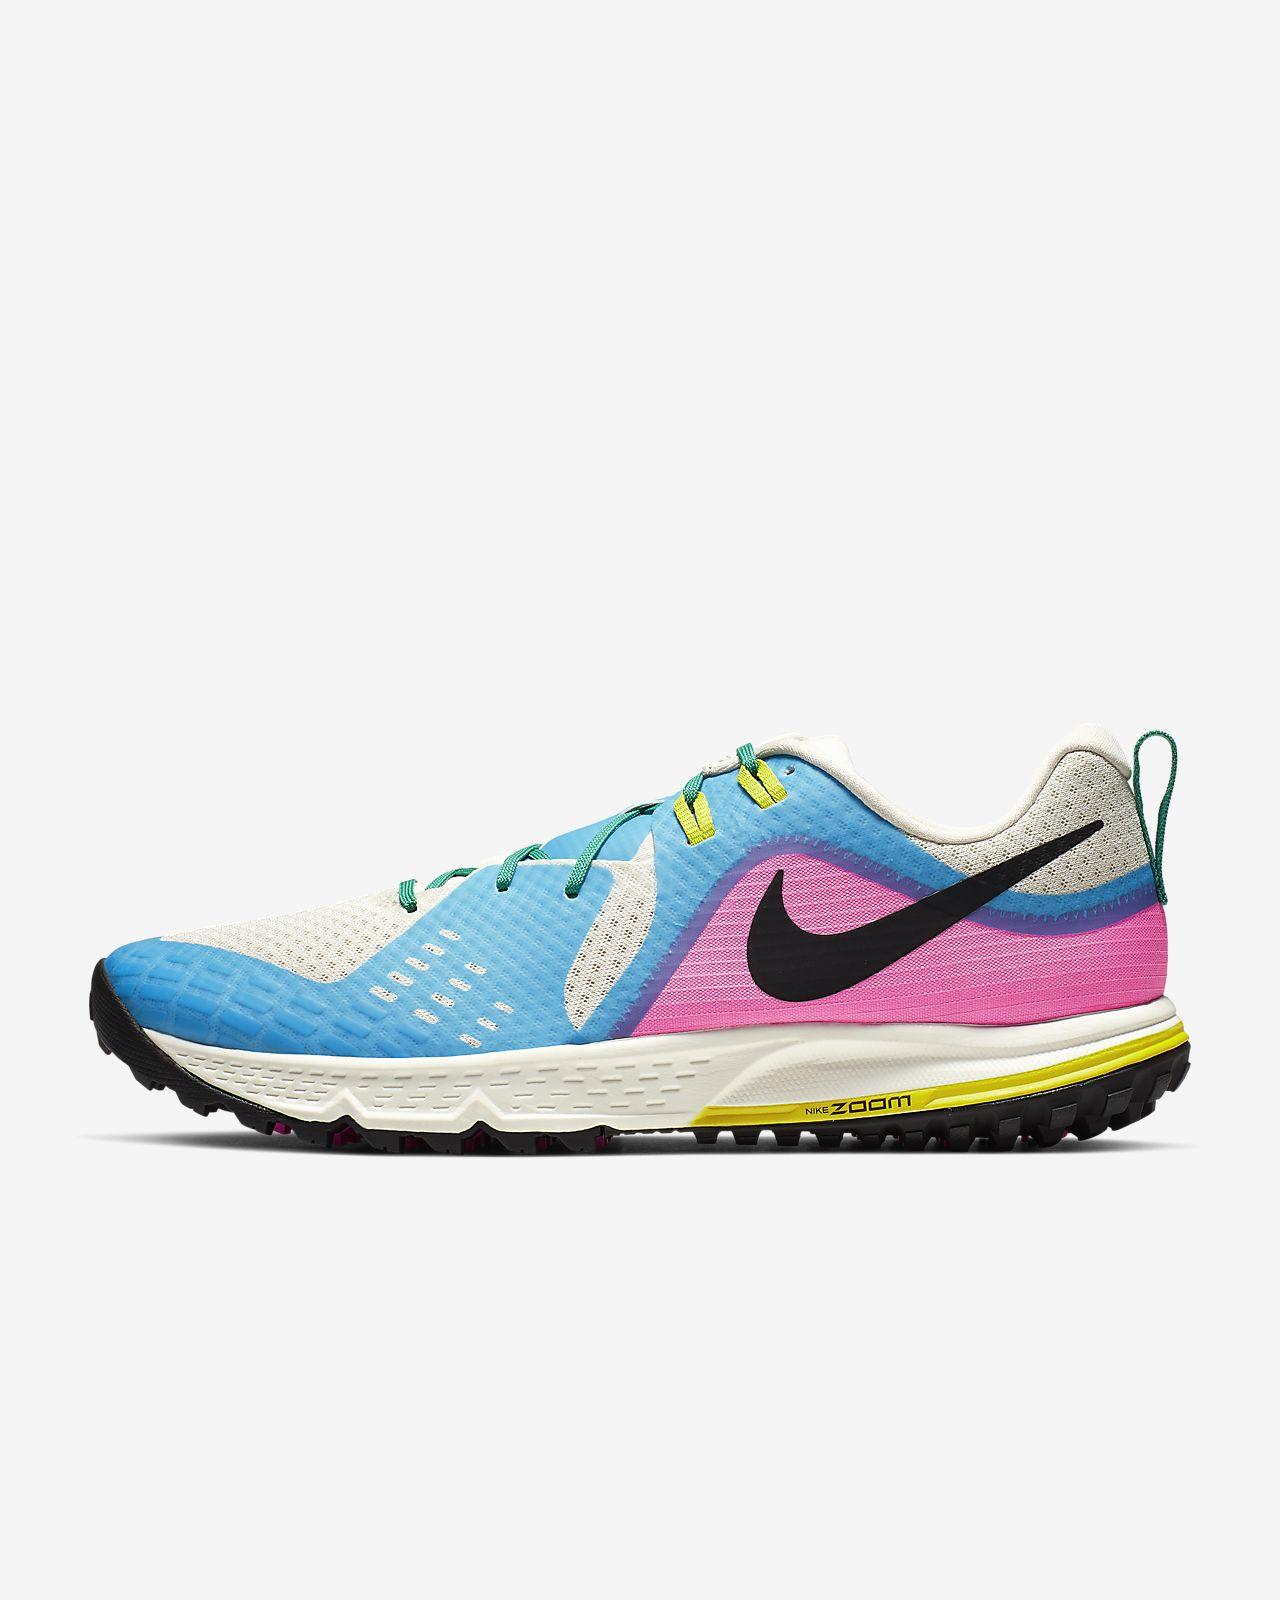 Nike Air Zoom Wildhorse 5 男子跑步鞋